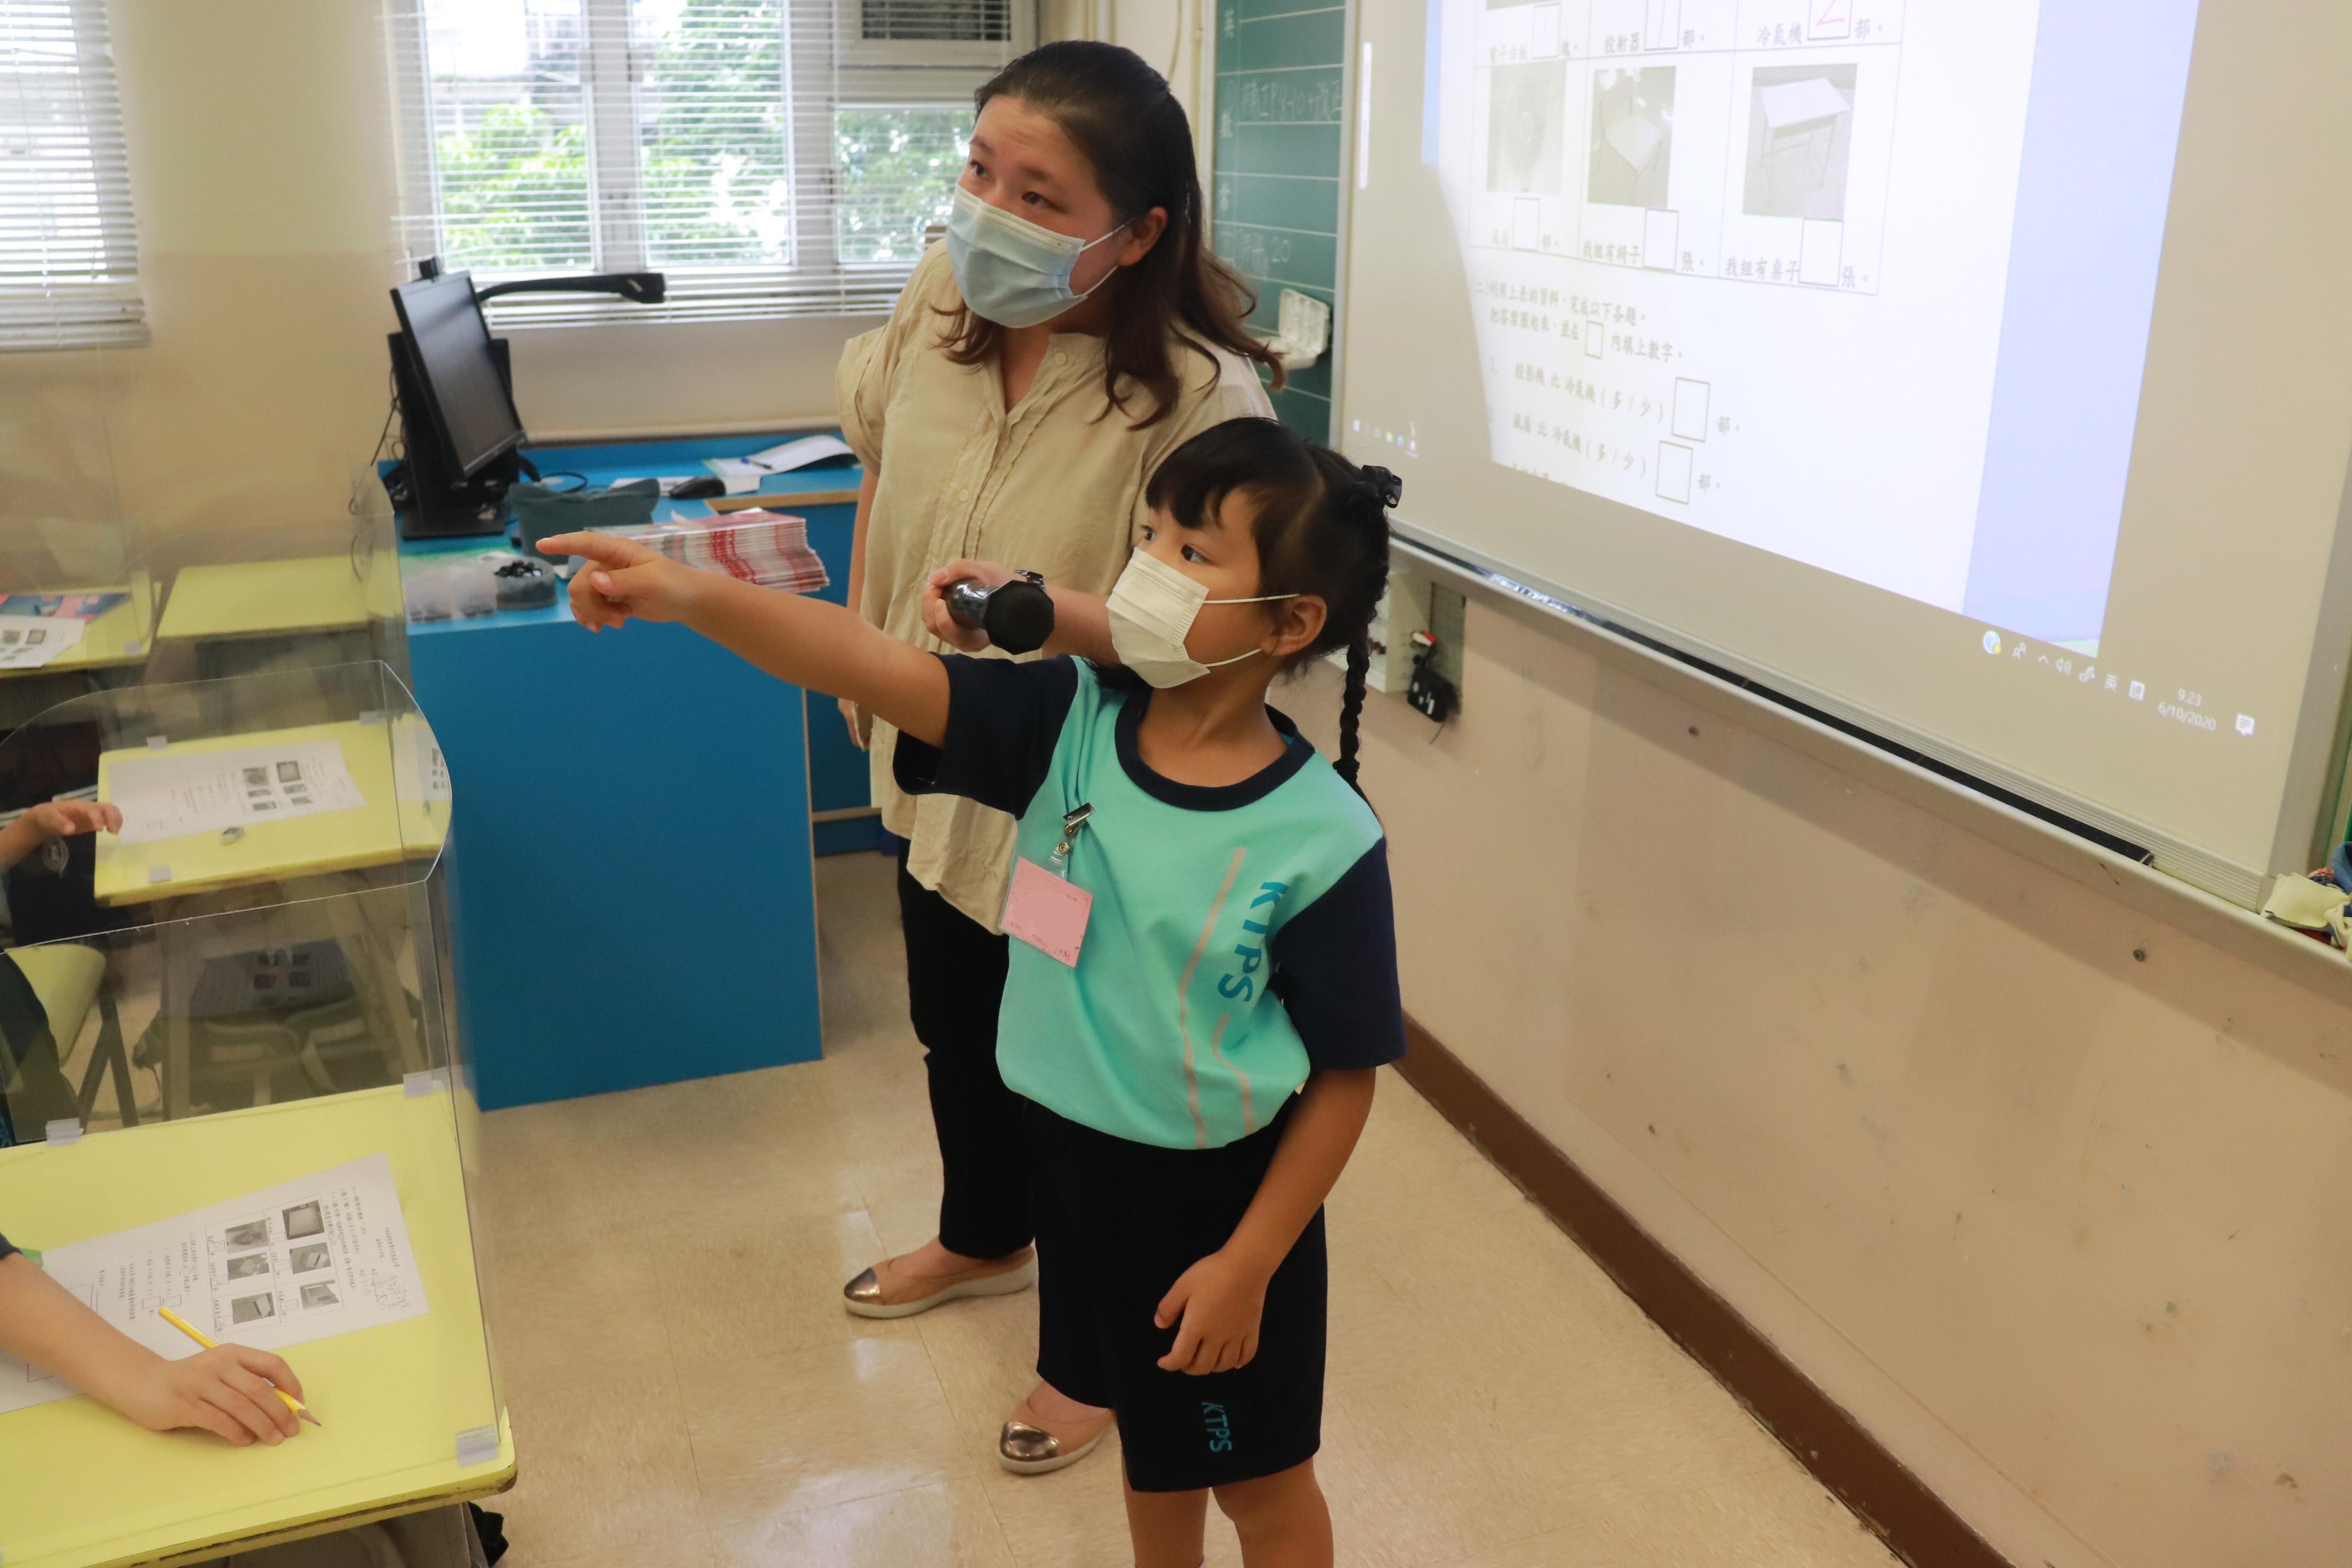 http://keito.school.hk/sites/default/files/img_6188.jpg